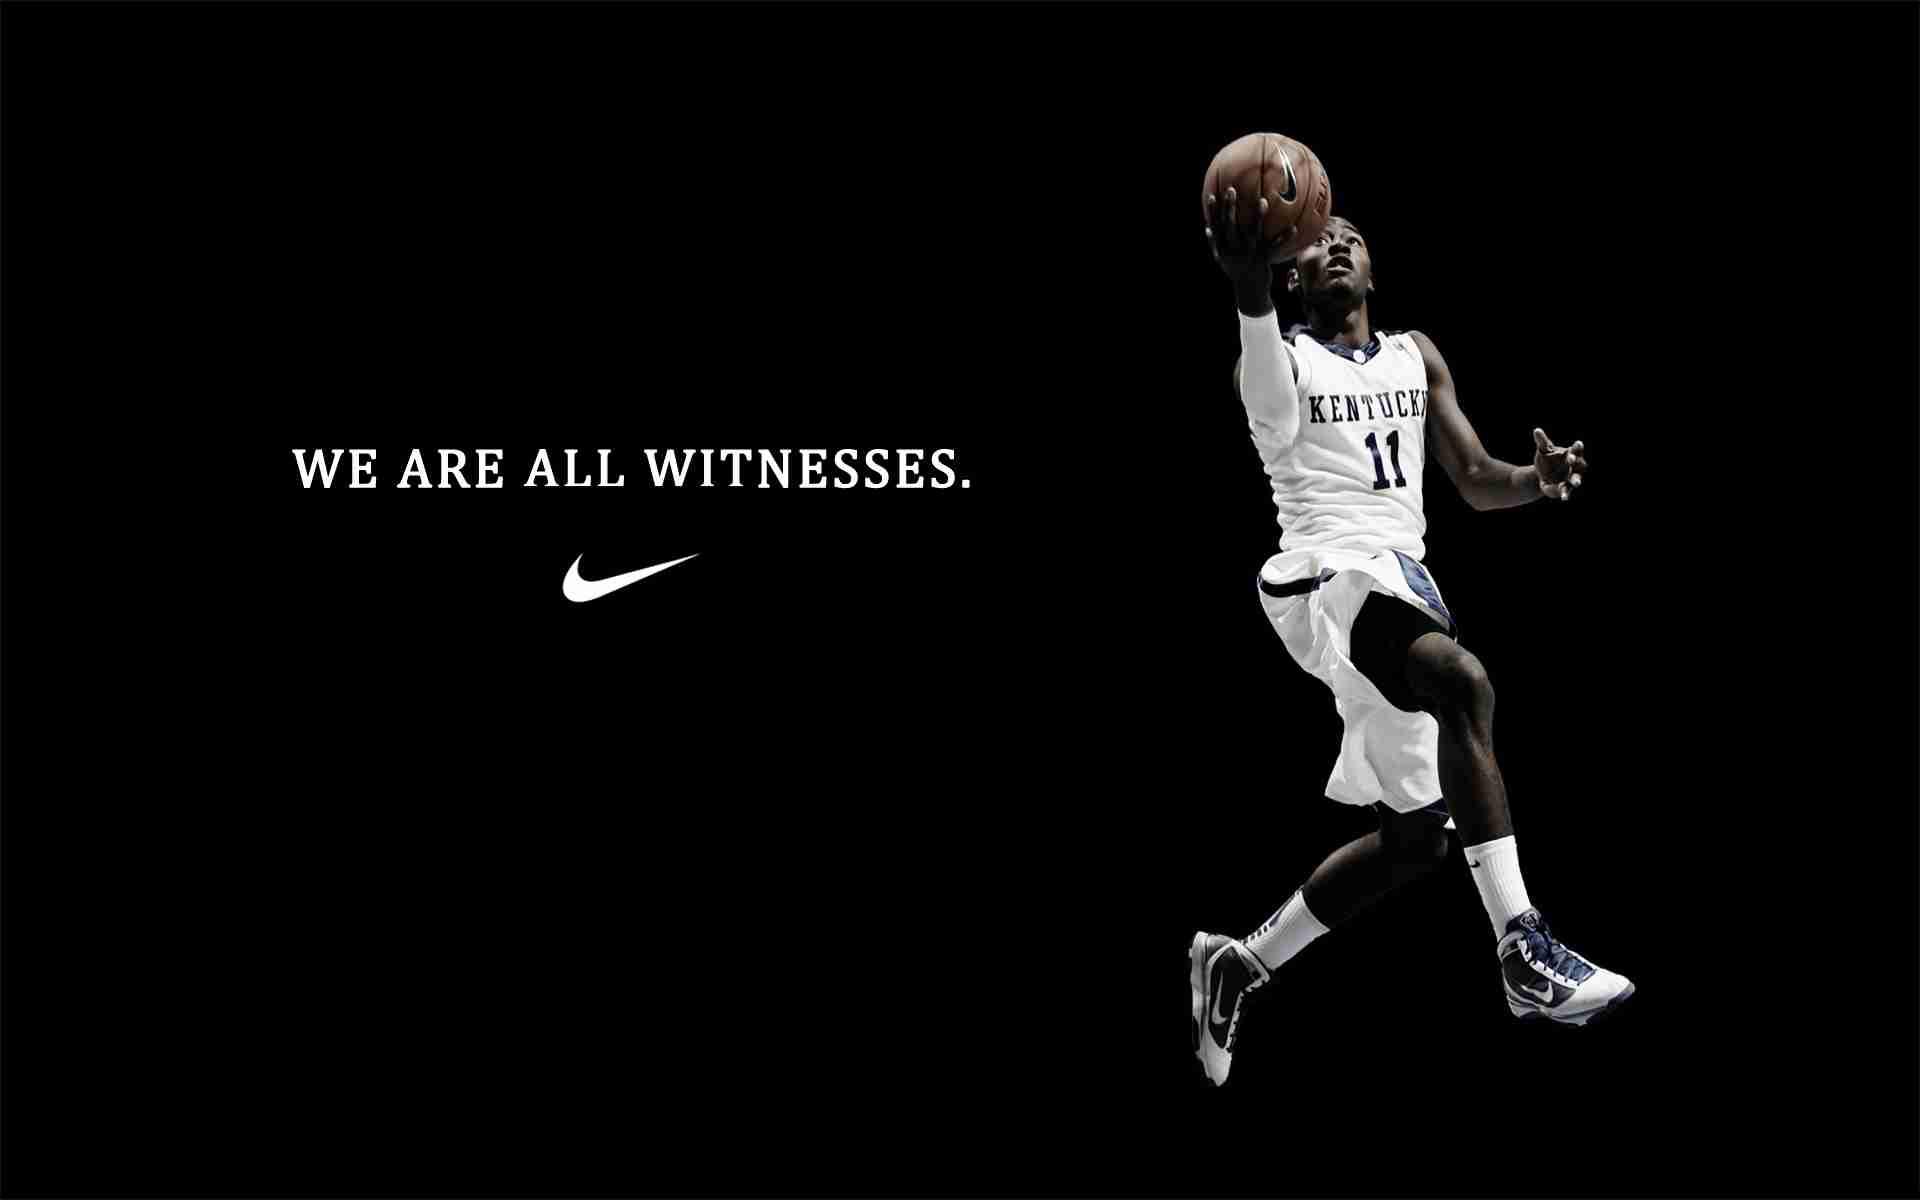 Спорт баскетбол парень форма надпись